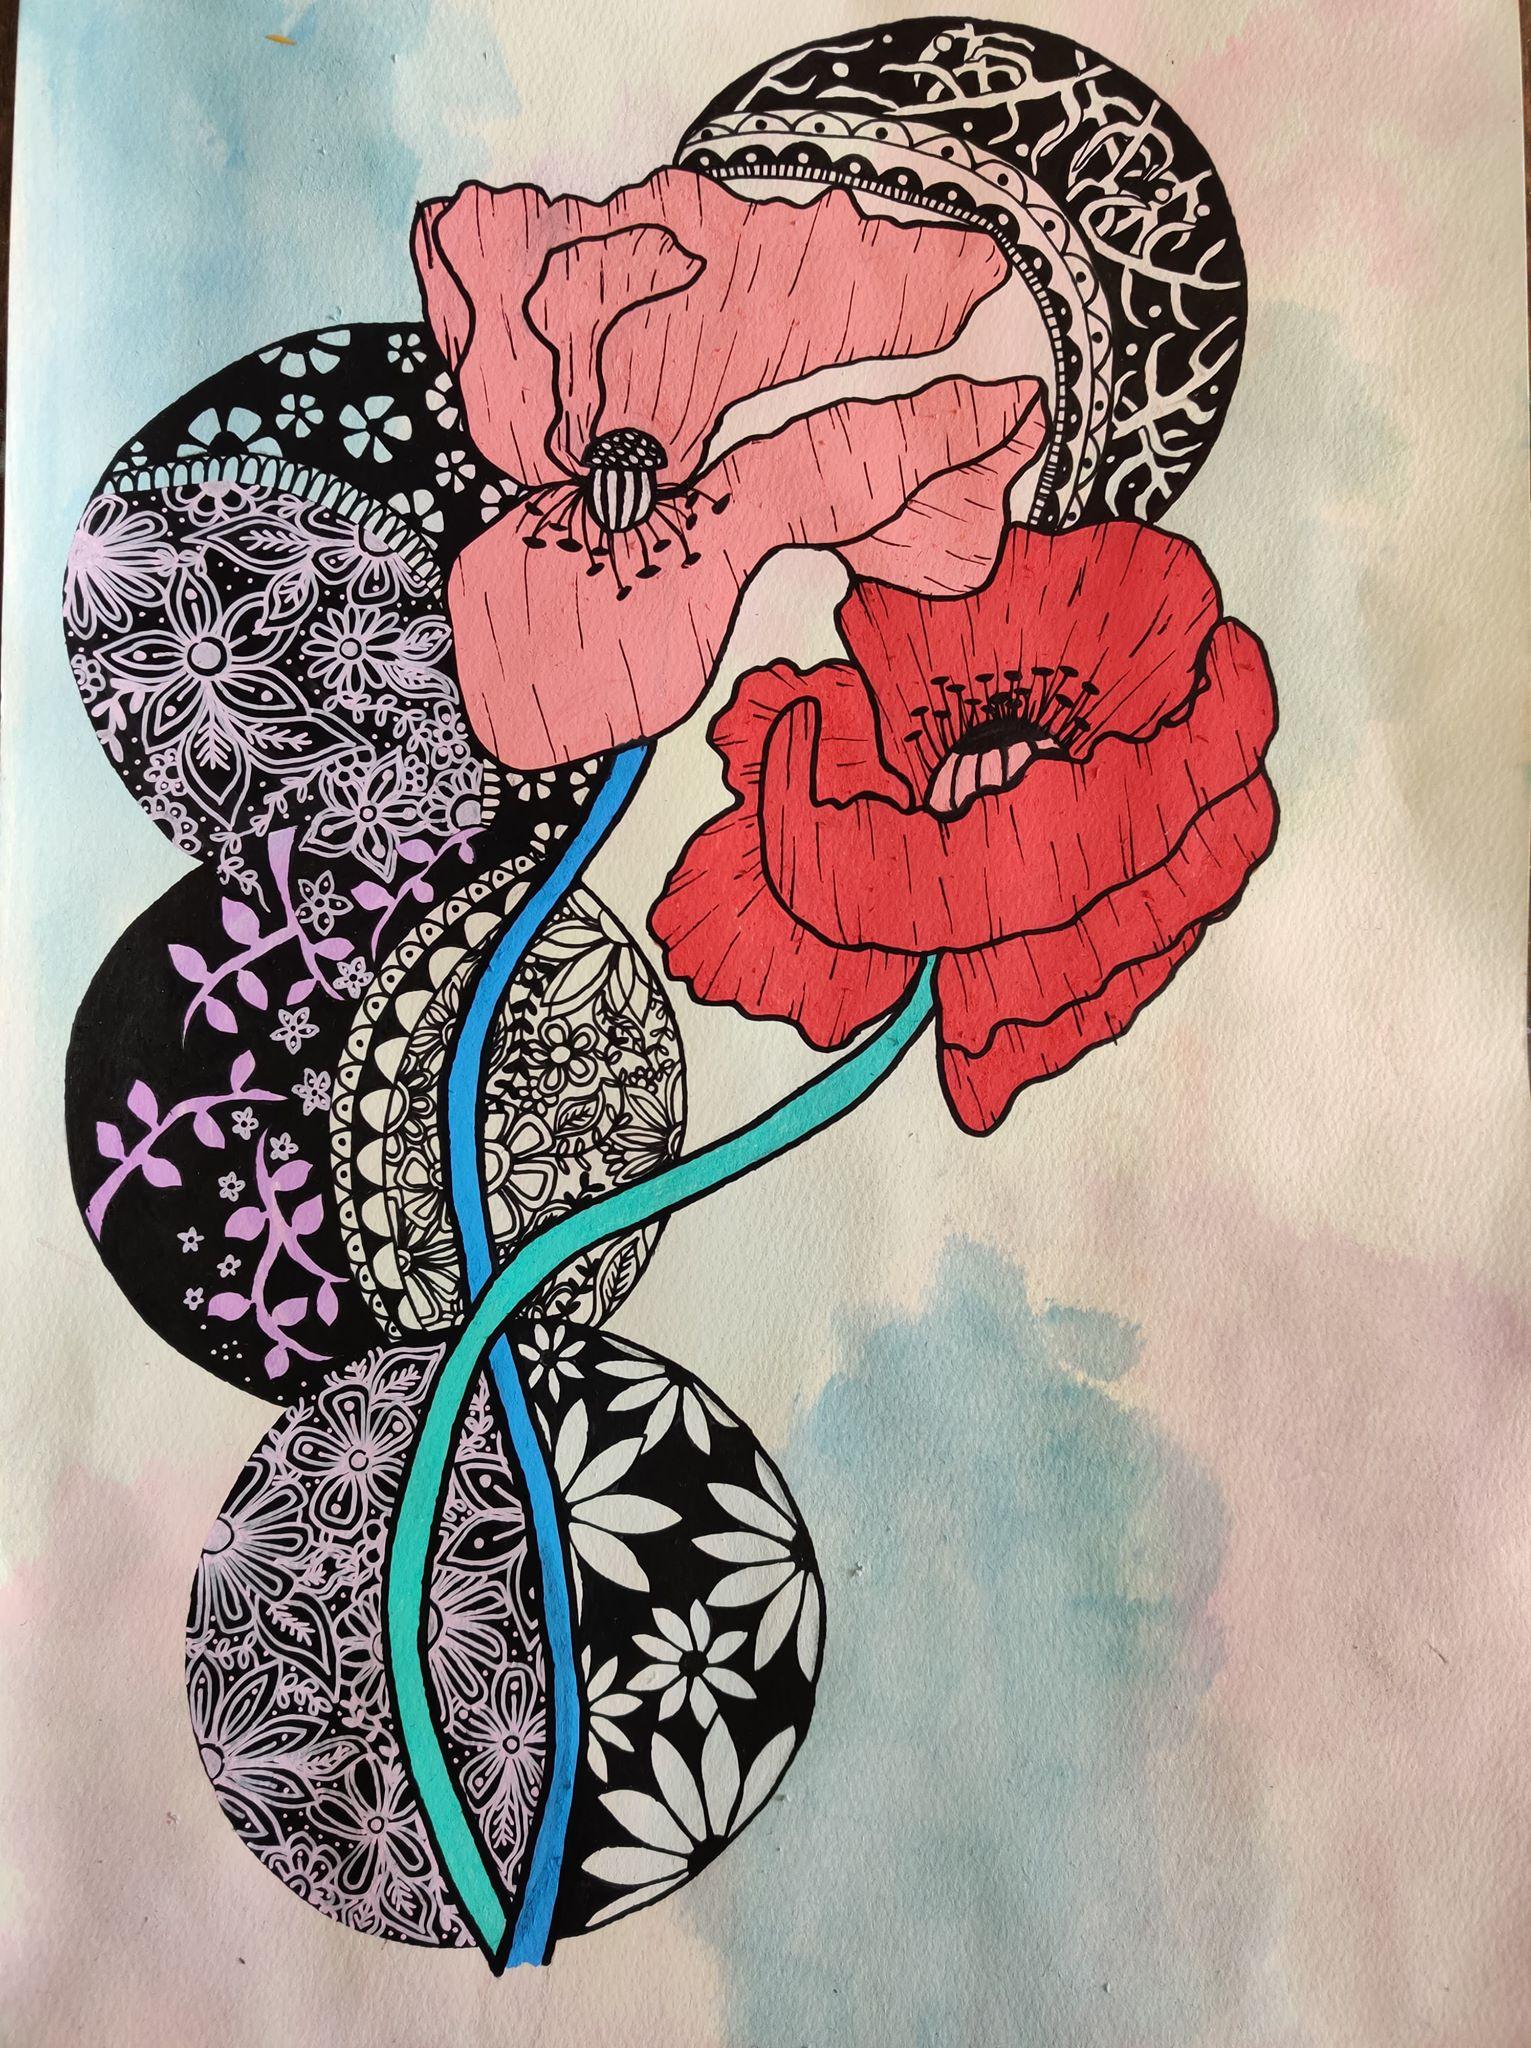 UK Artist Abbie Rose Nicholls